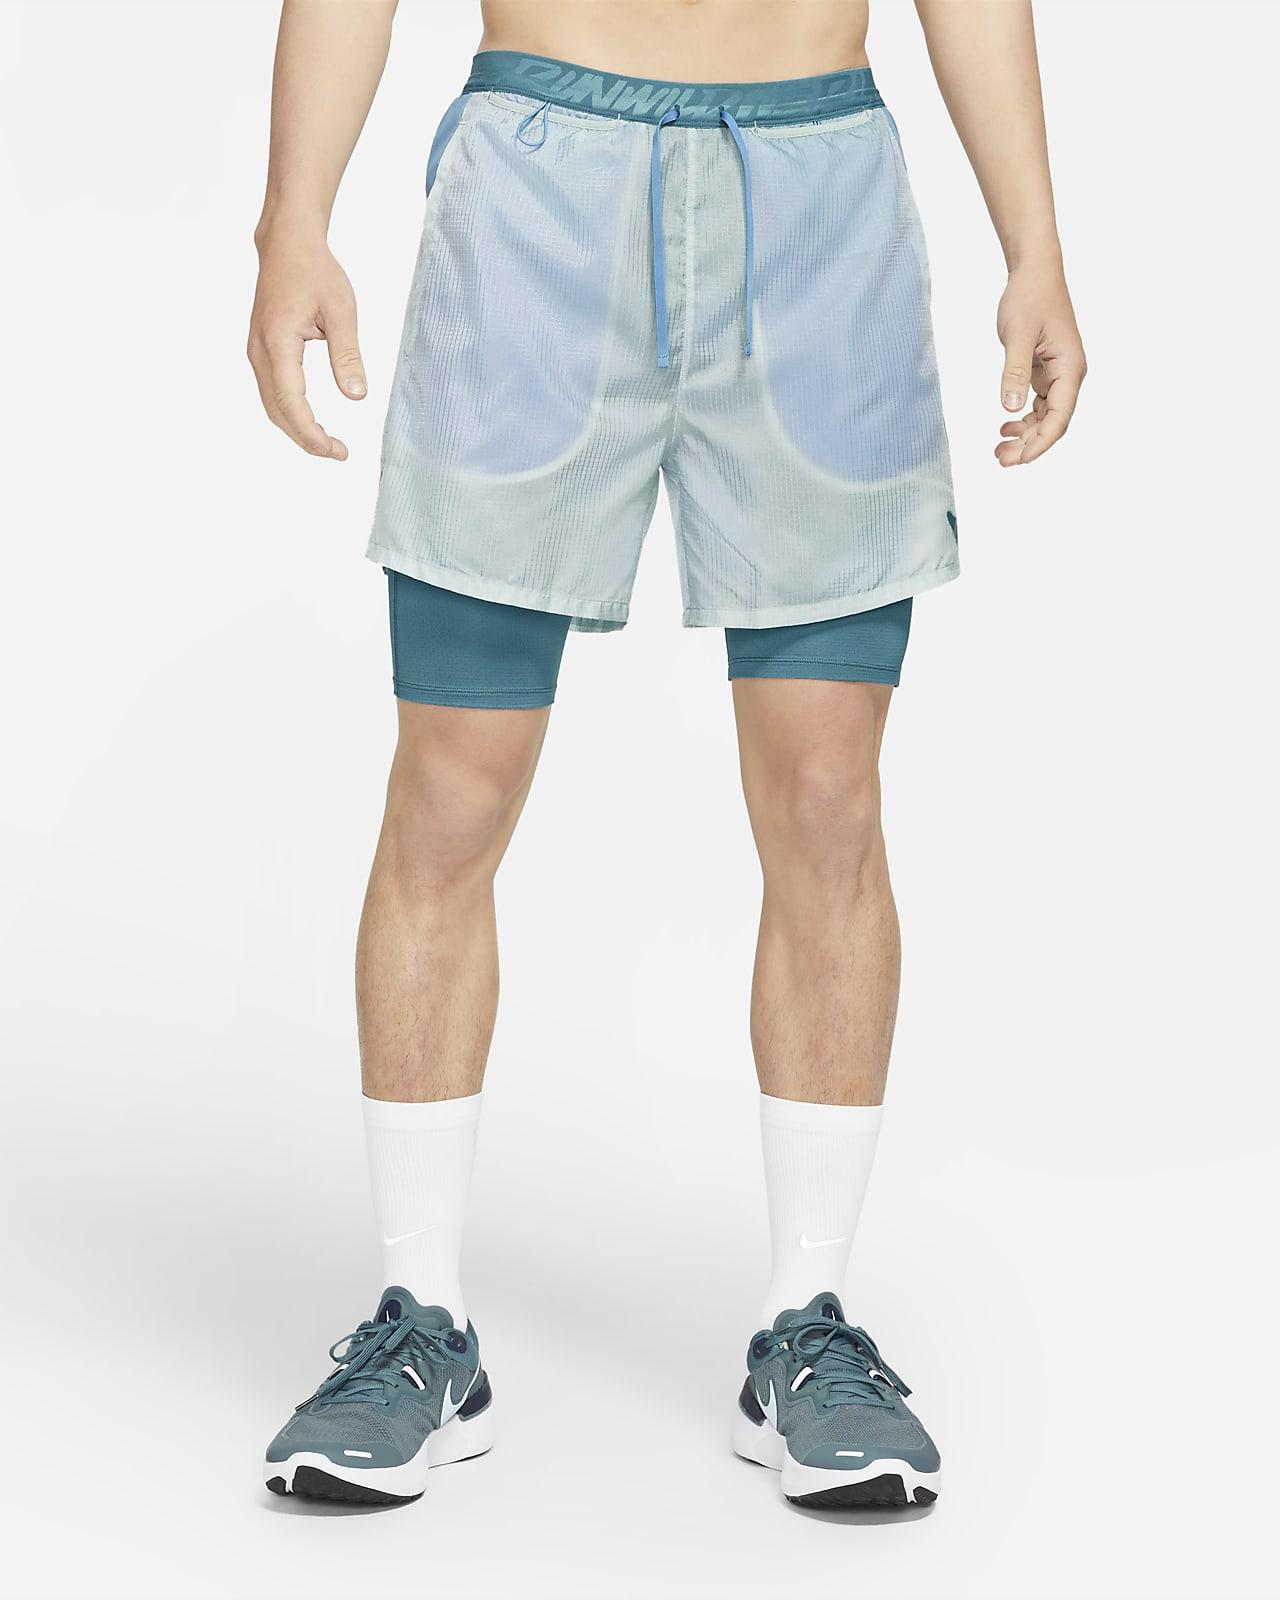 Nike Dri-FIT Wild Run Flex Stride Men's 2-In-1 18cm (approx.) Running Shorts